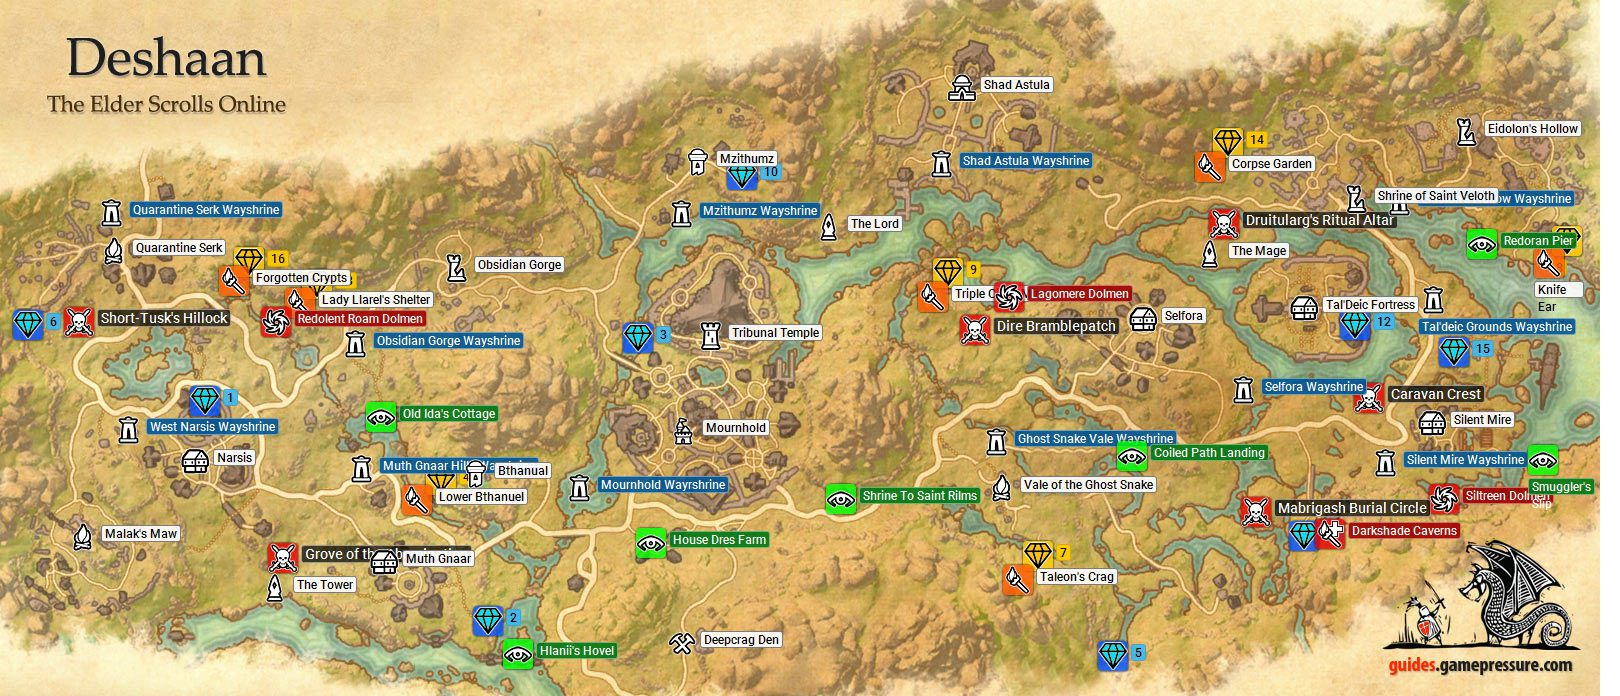 Deshaan Ebonheart Pact The Elder Scrolls Online Game